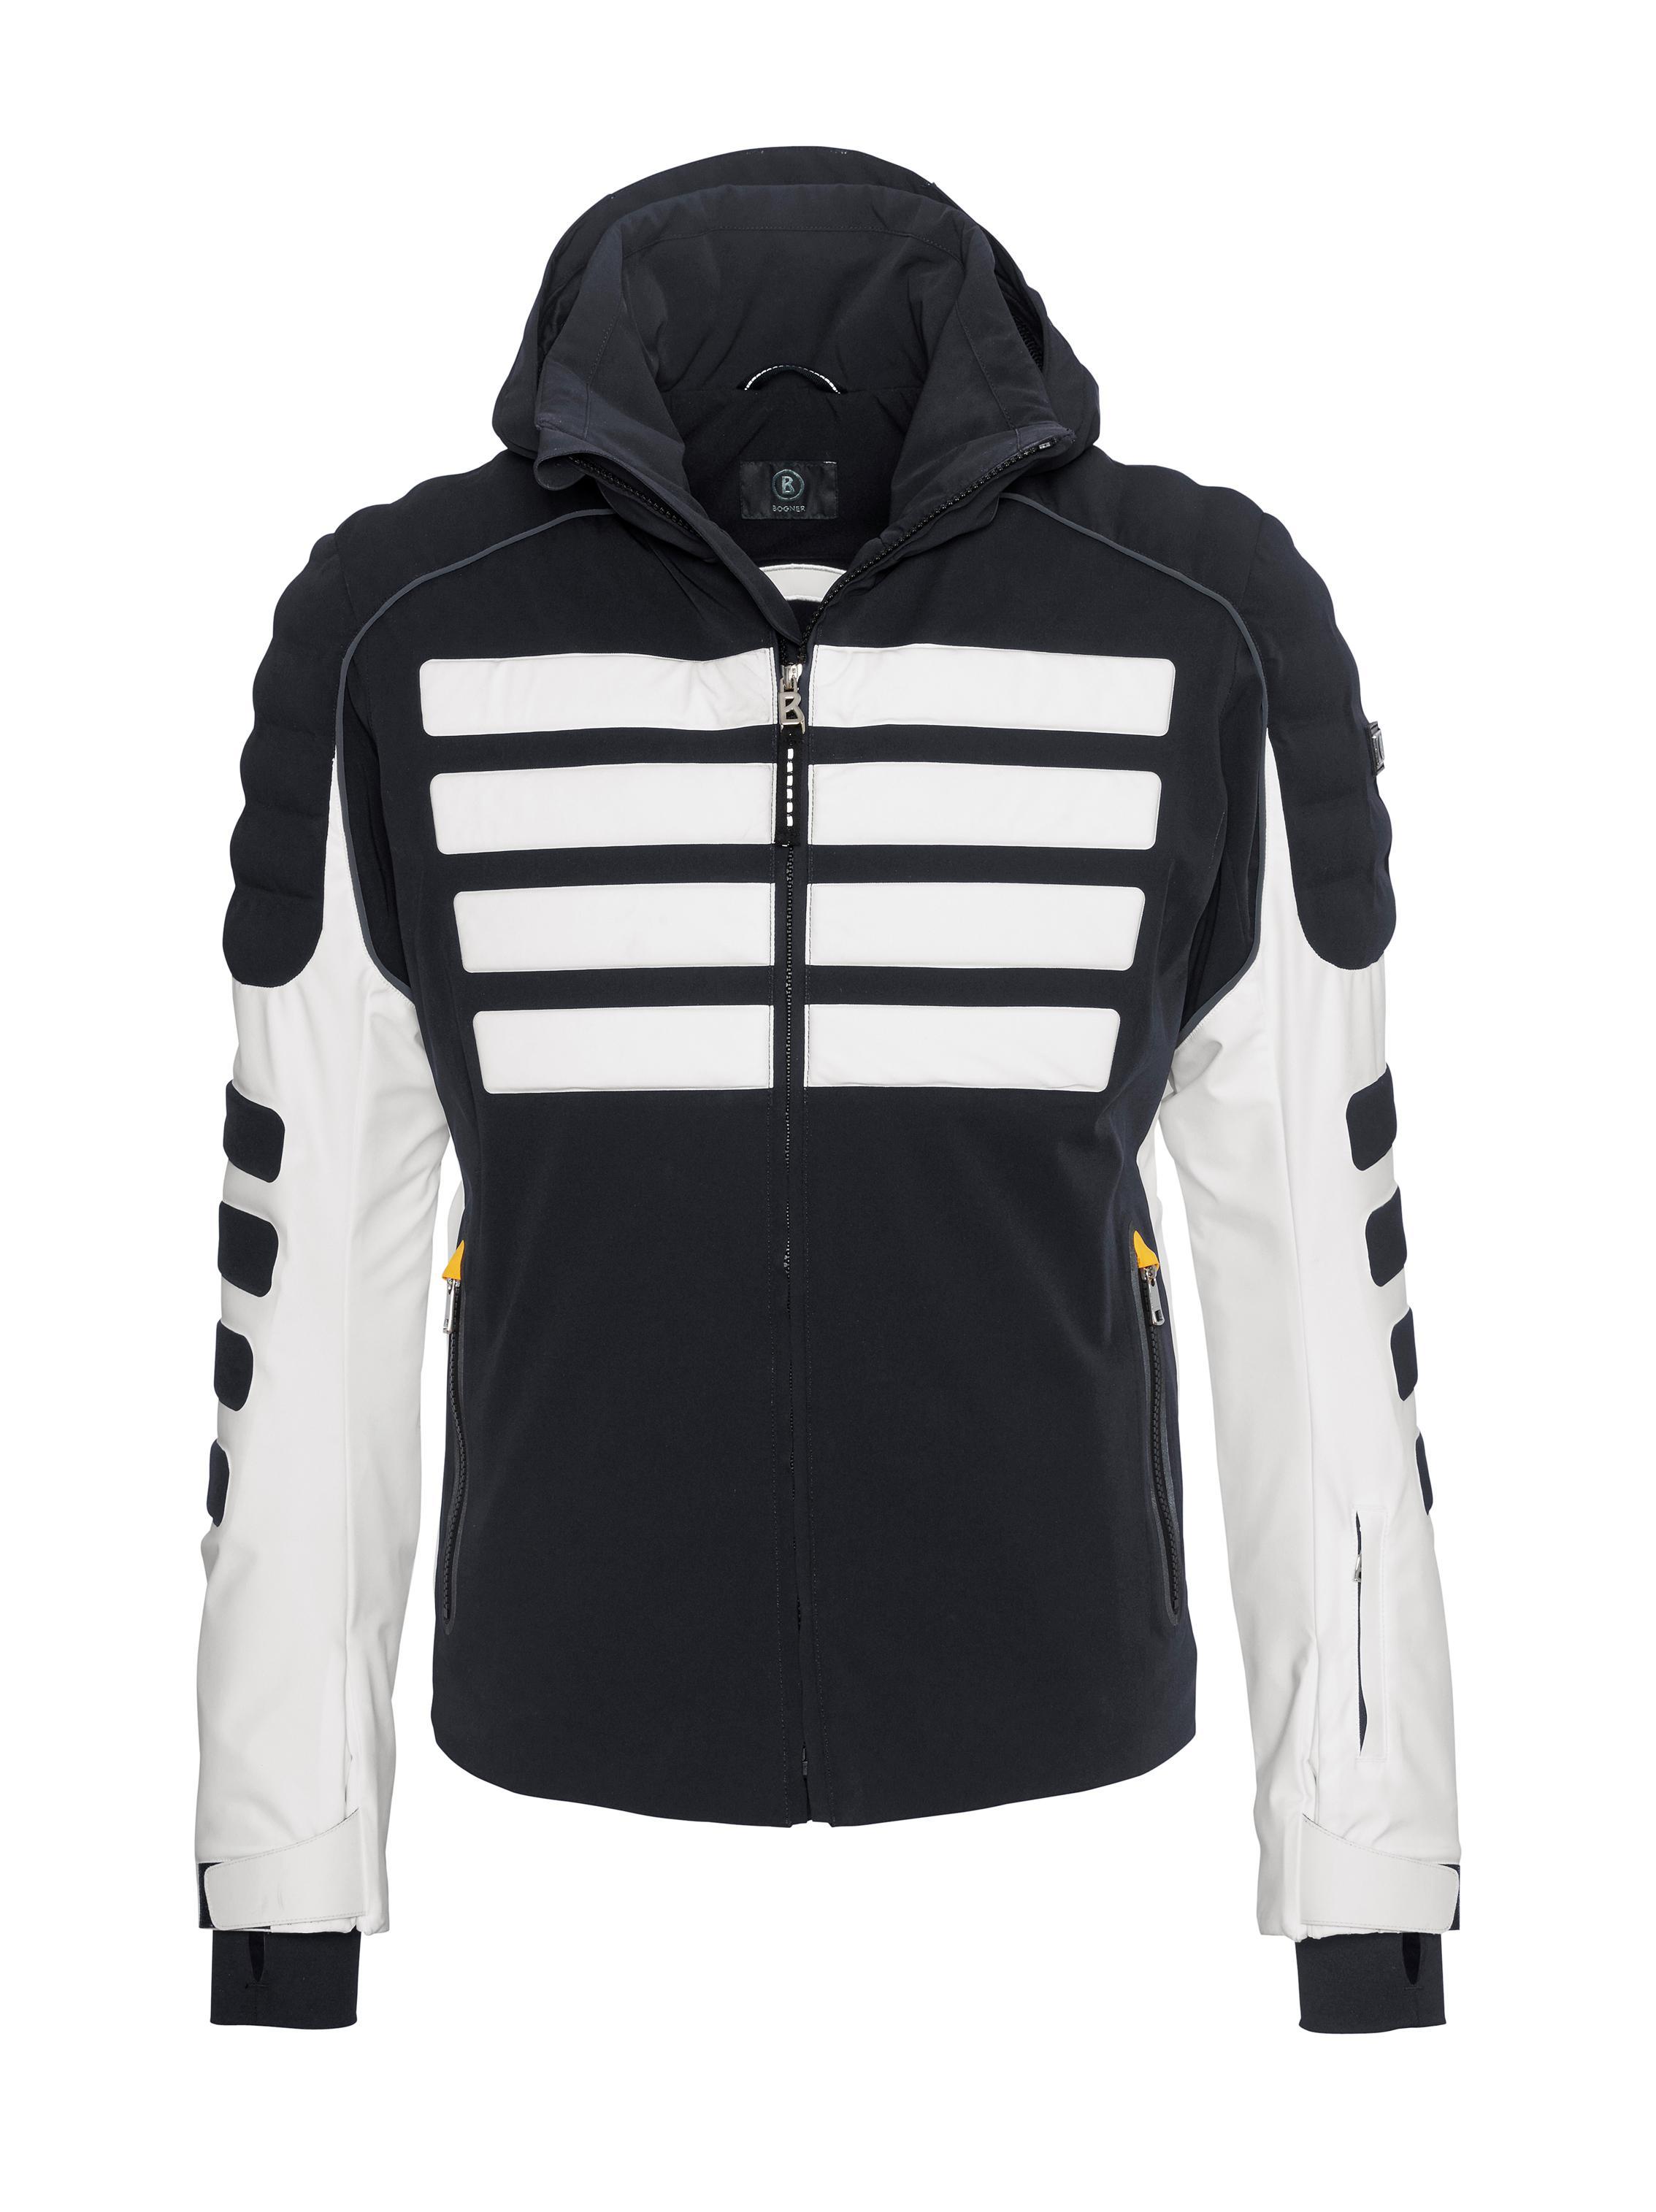 online store 9573c 9953e Bogner Synthetic Ski Jacket Nik in Black for Men - Lyst